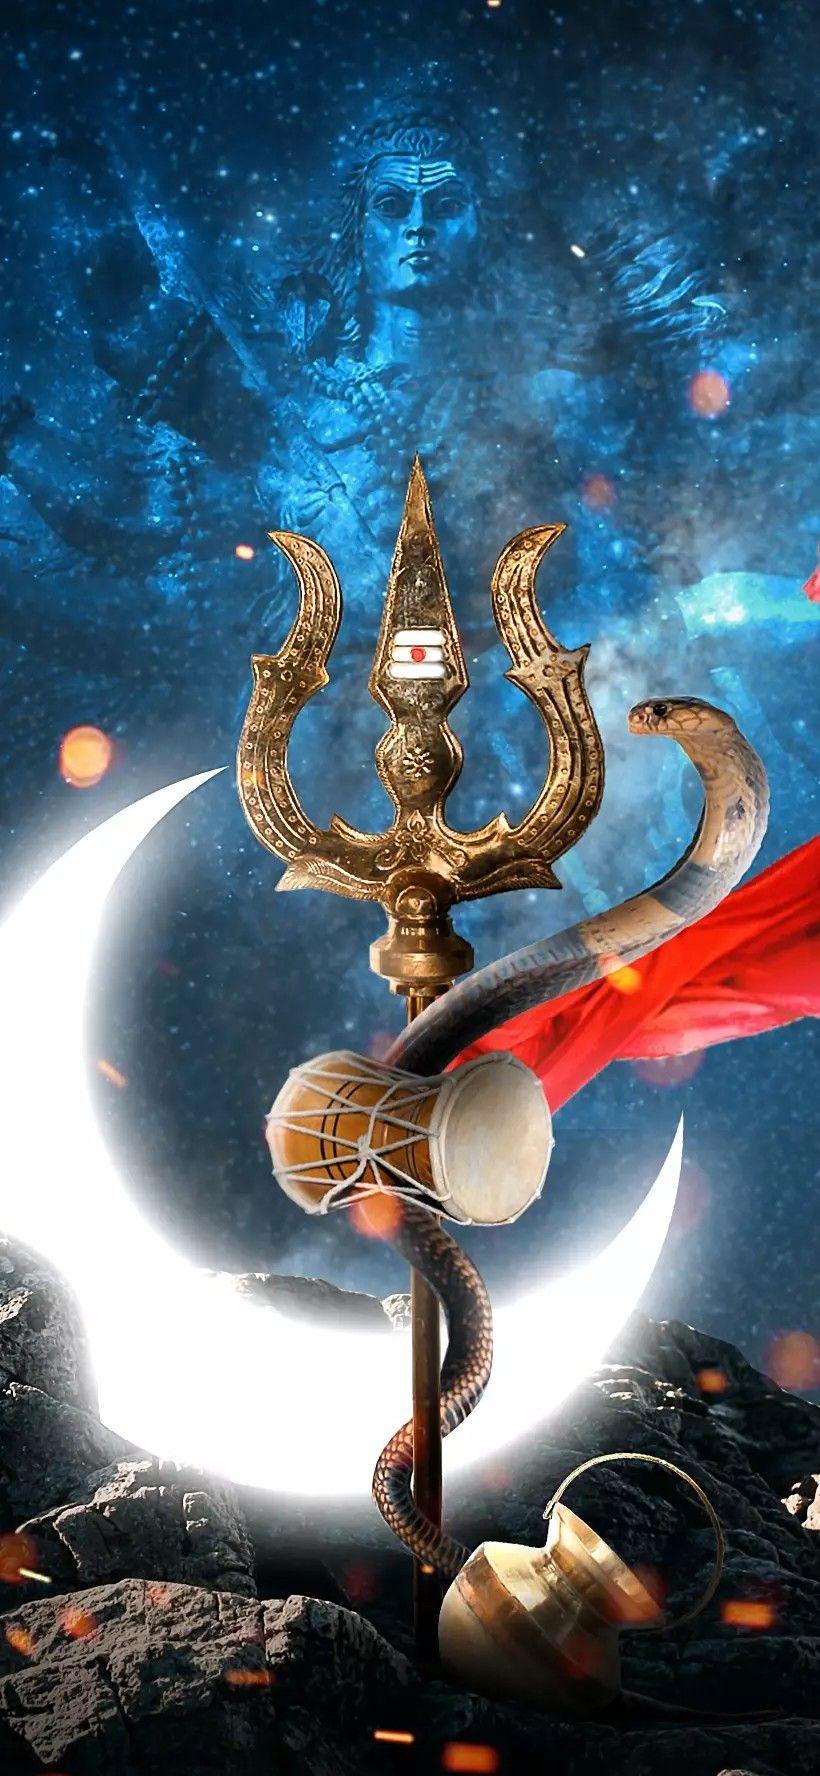 Pin By Shrawan Pandey On Hindus Lord Shiva Hd Wallpaper Shiva Wallpaper Shiva Lord Wallpapers